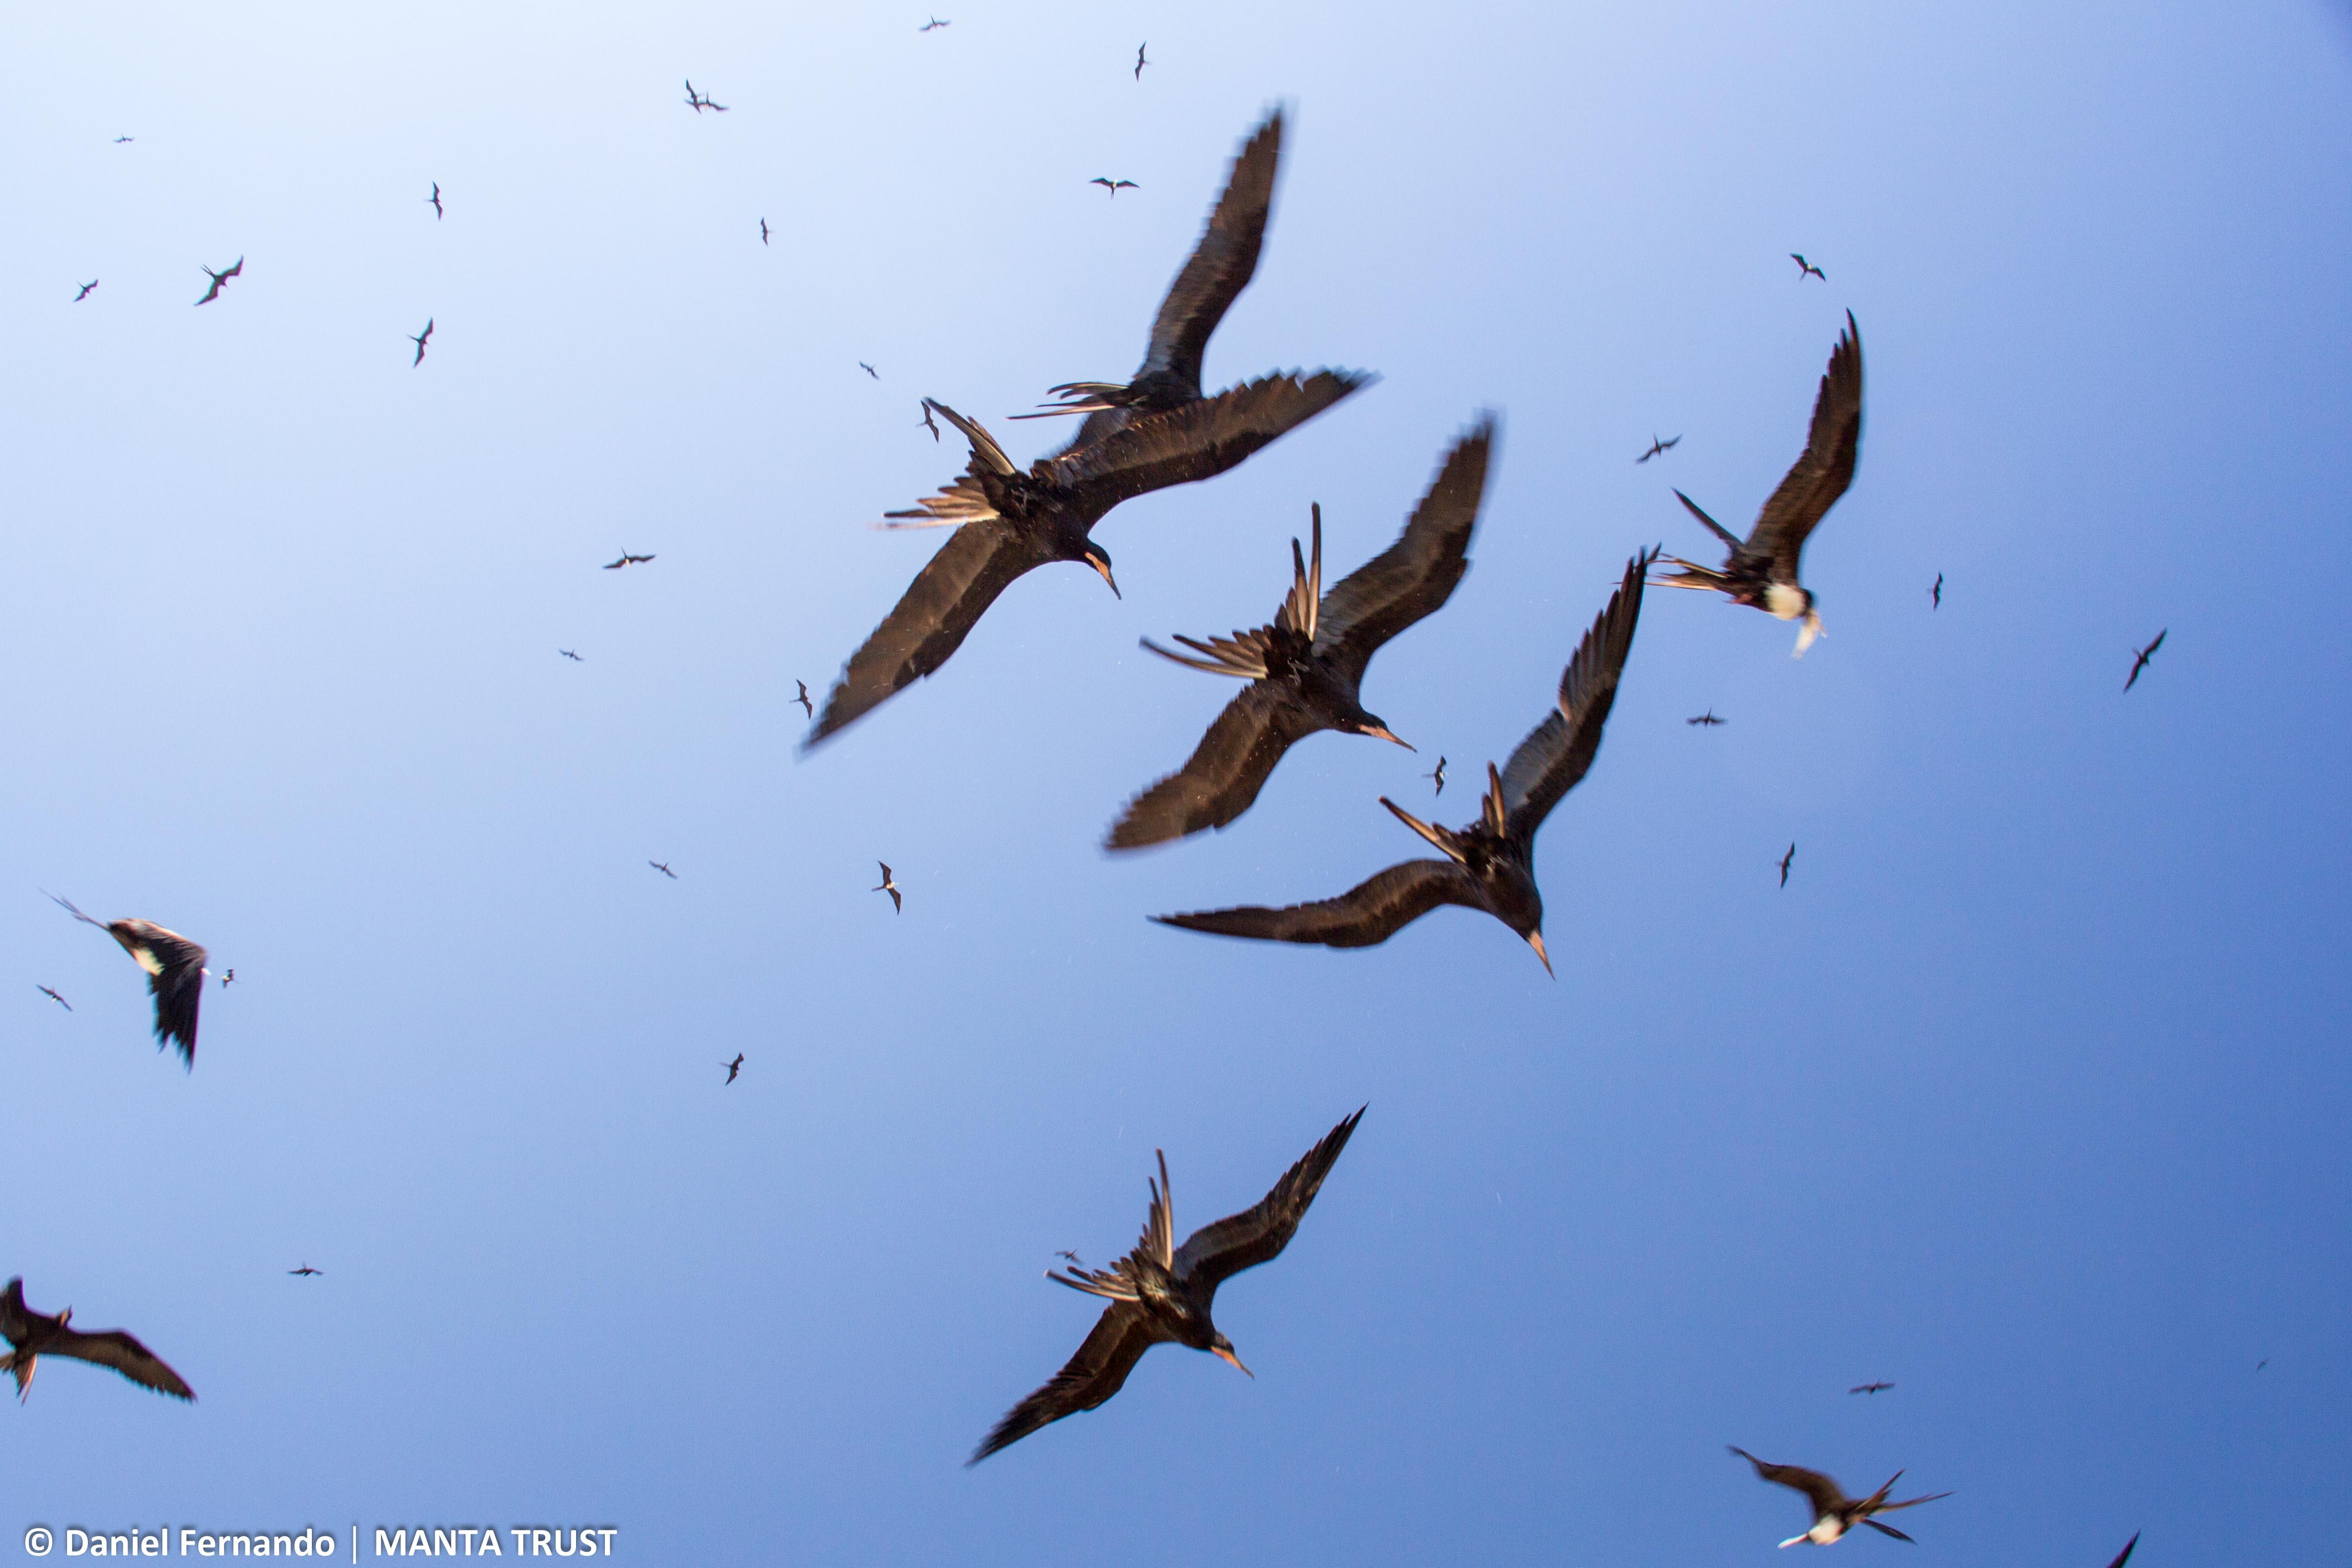 © Daniel Fernando – opportunistic birds at the fish market